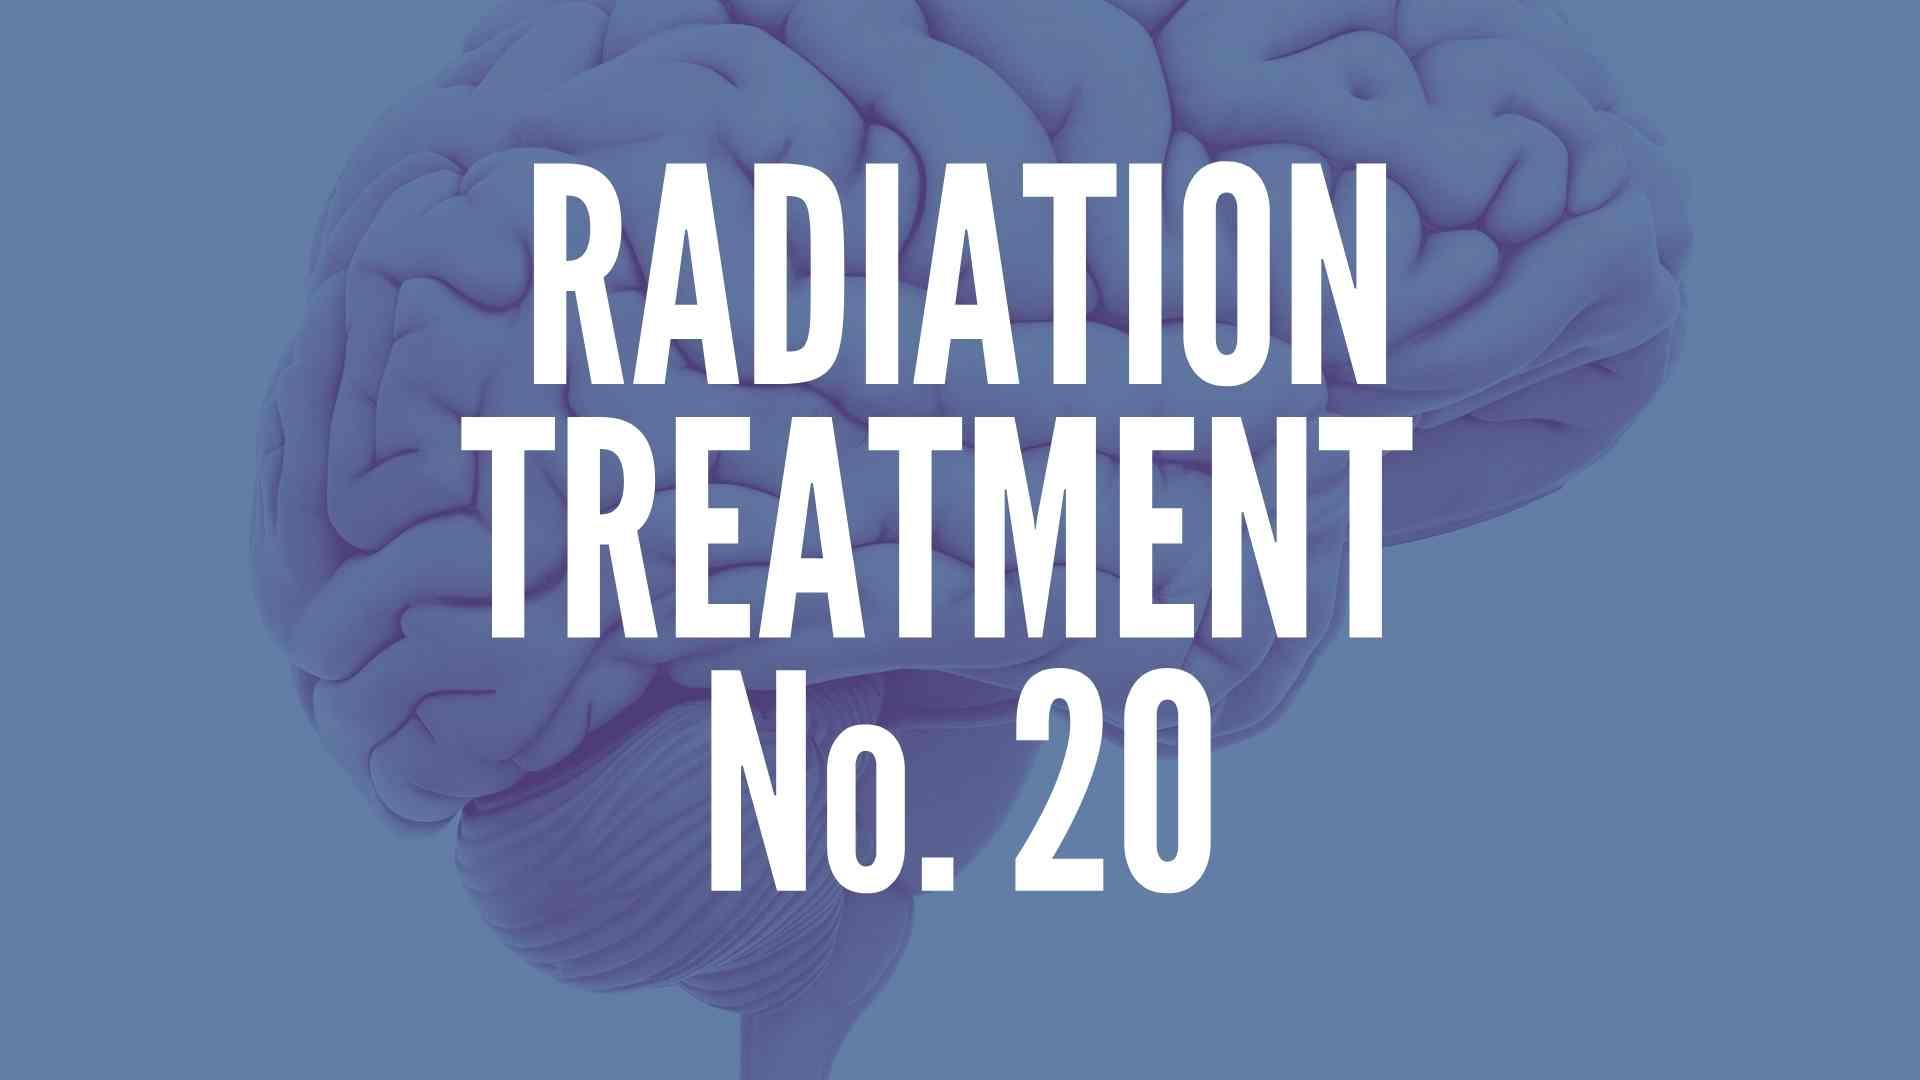 Brain Tumor Radiation Treatment 20